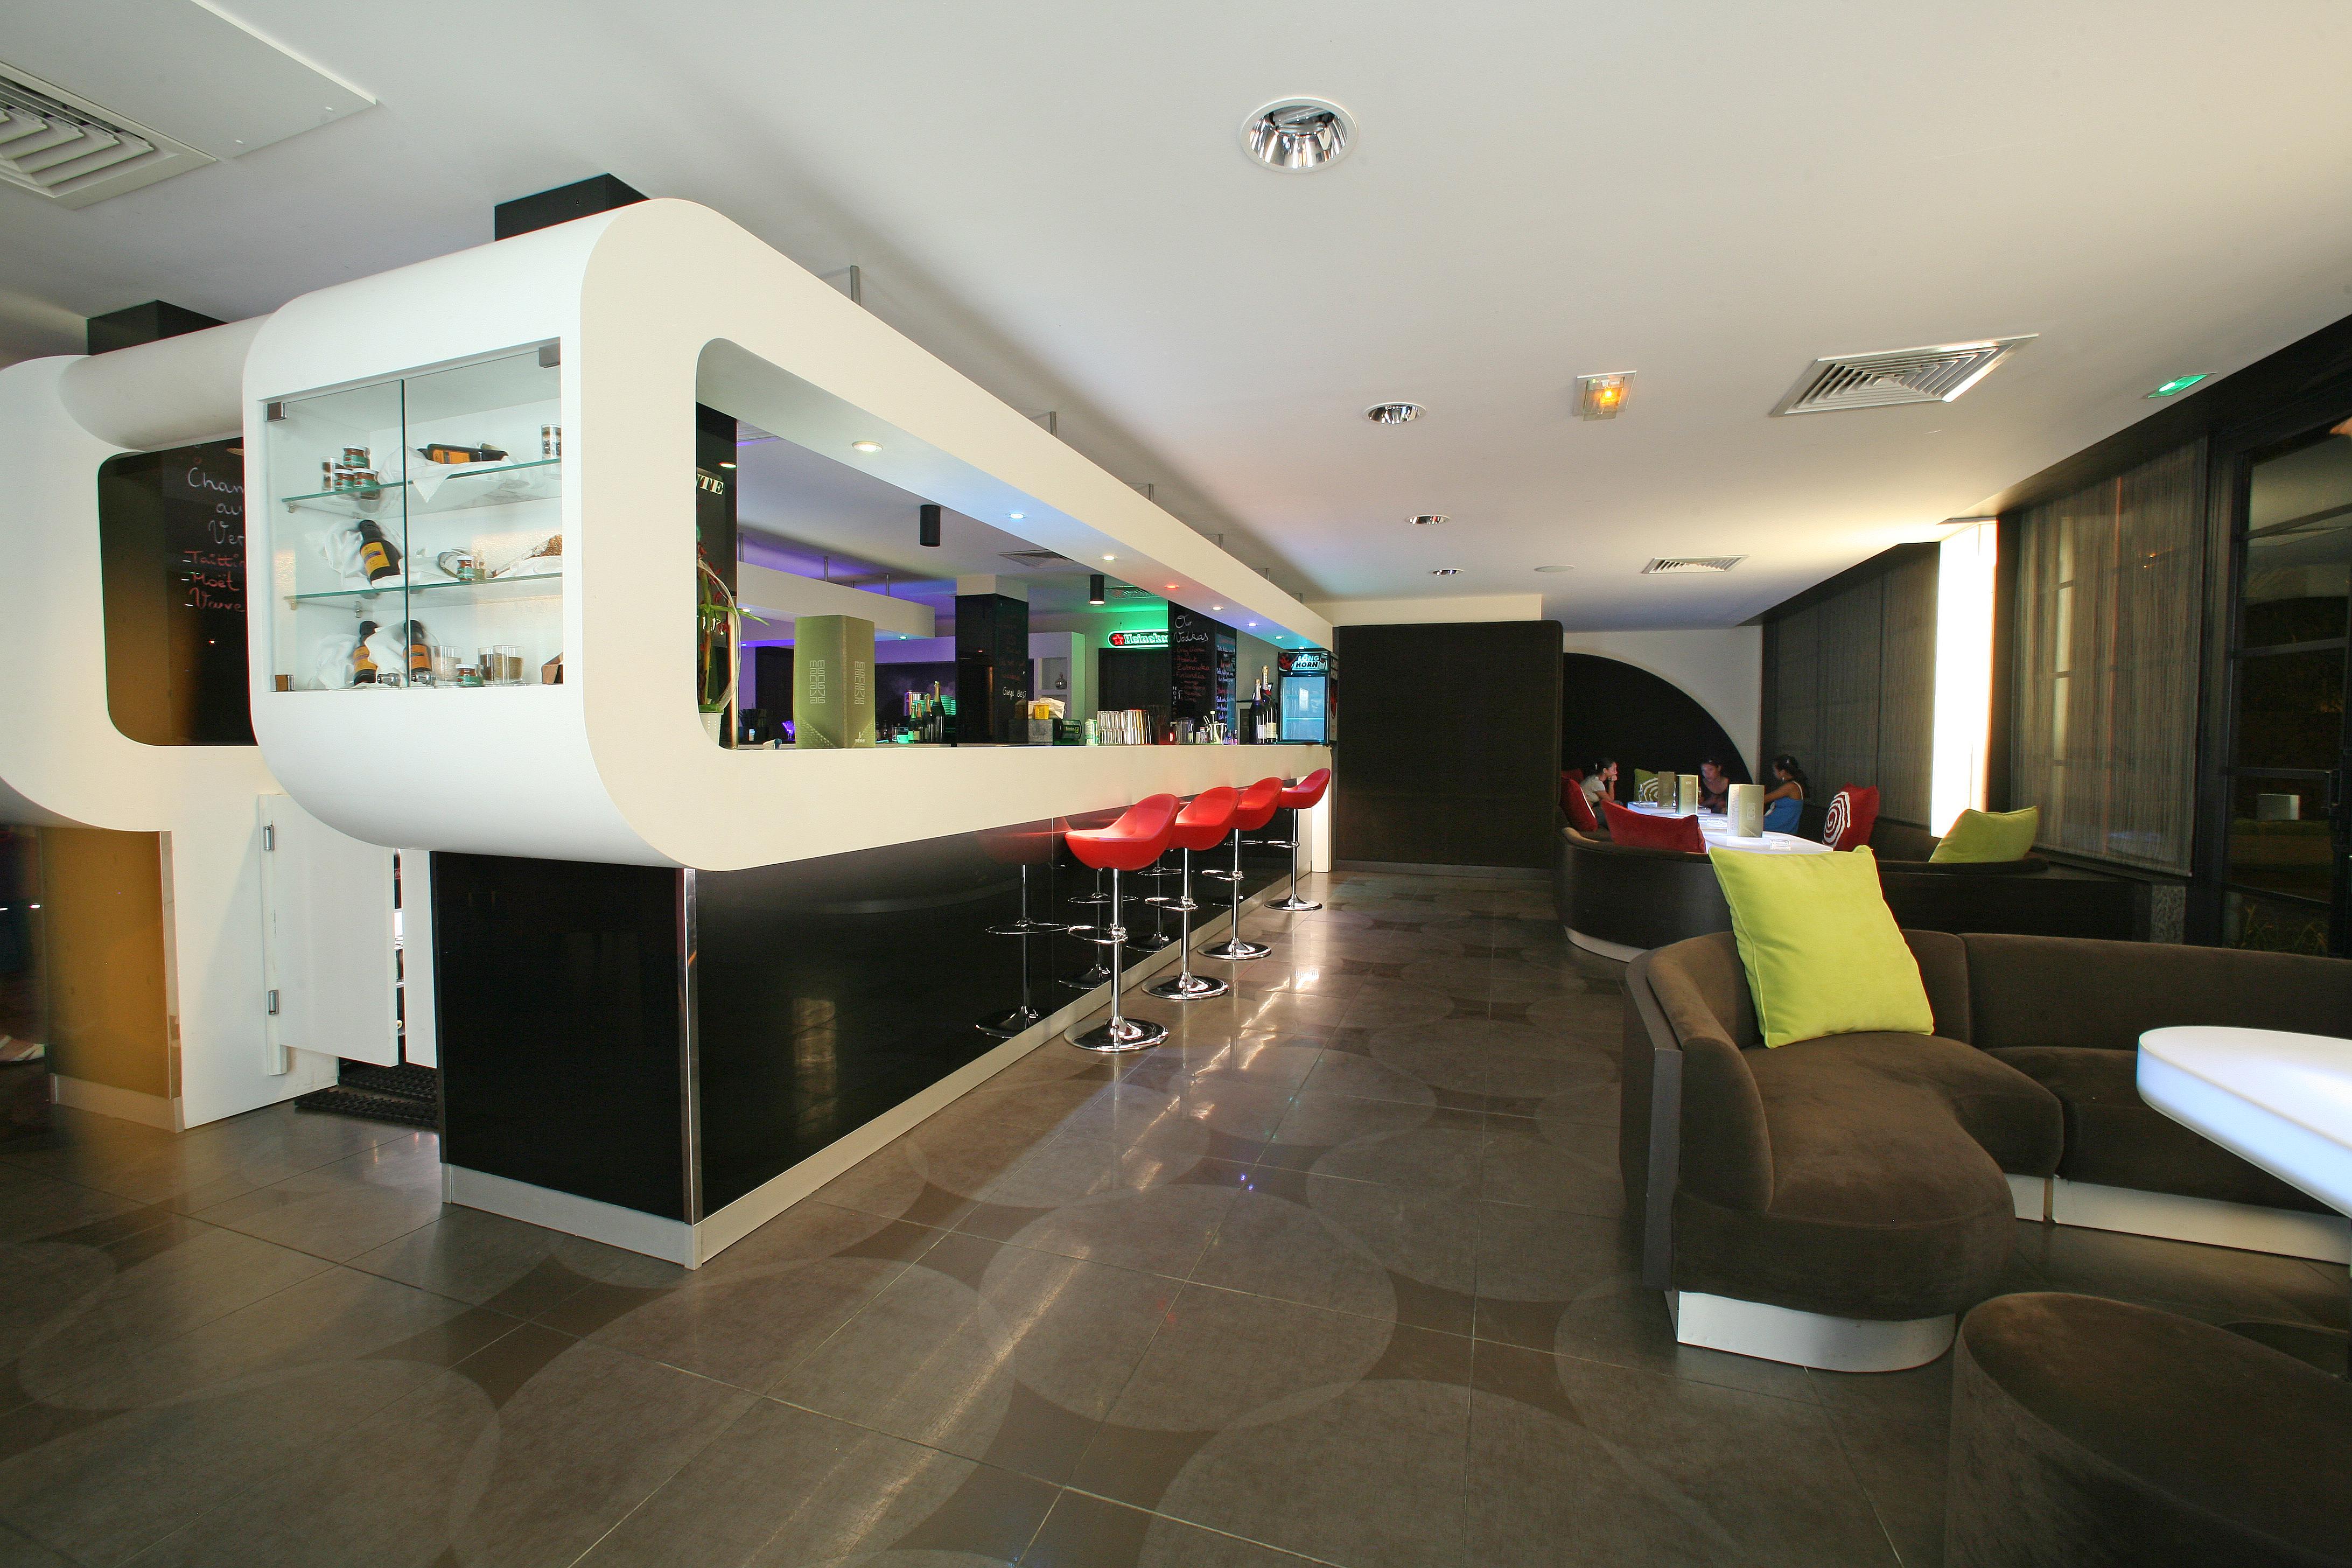 https://tahititourisme.com.au/wp-content/uploads/2018/03/RESTAURATION-Punavai-Lounge-Bar-1.jpg